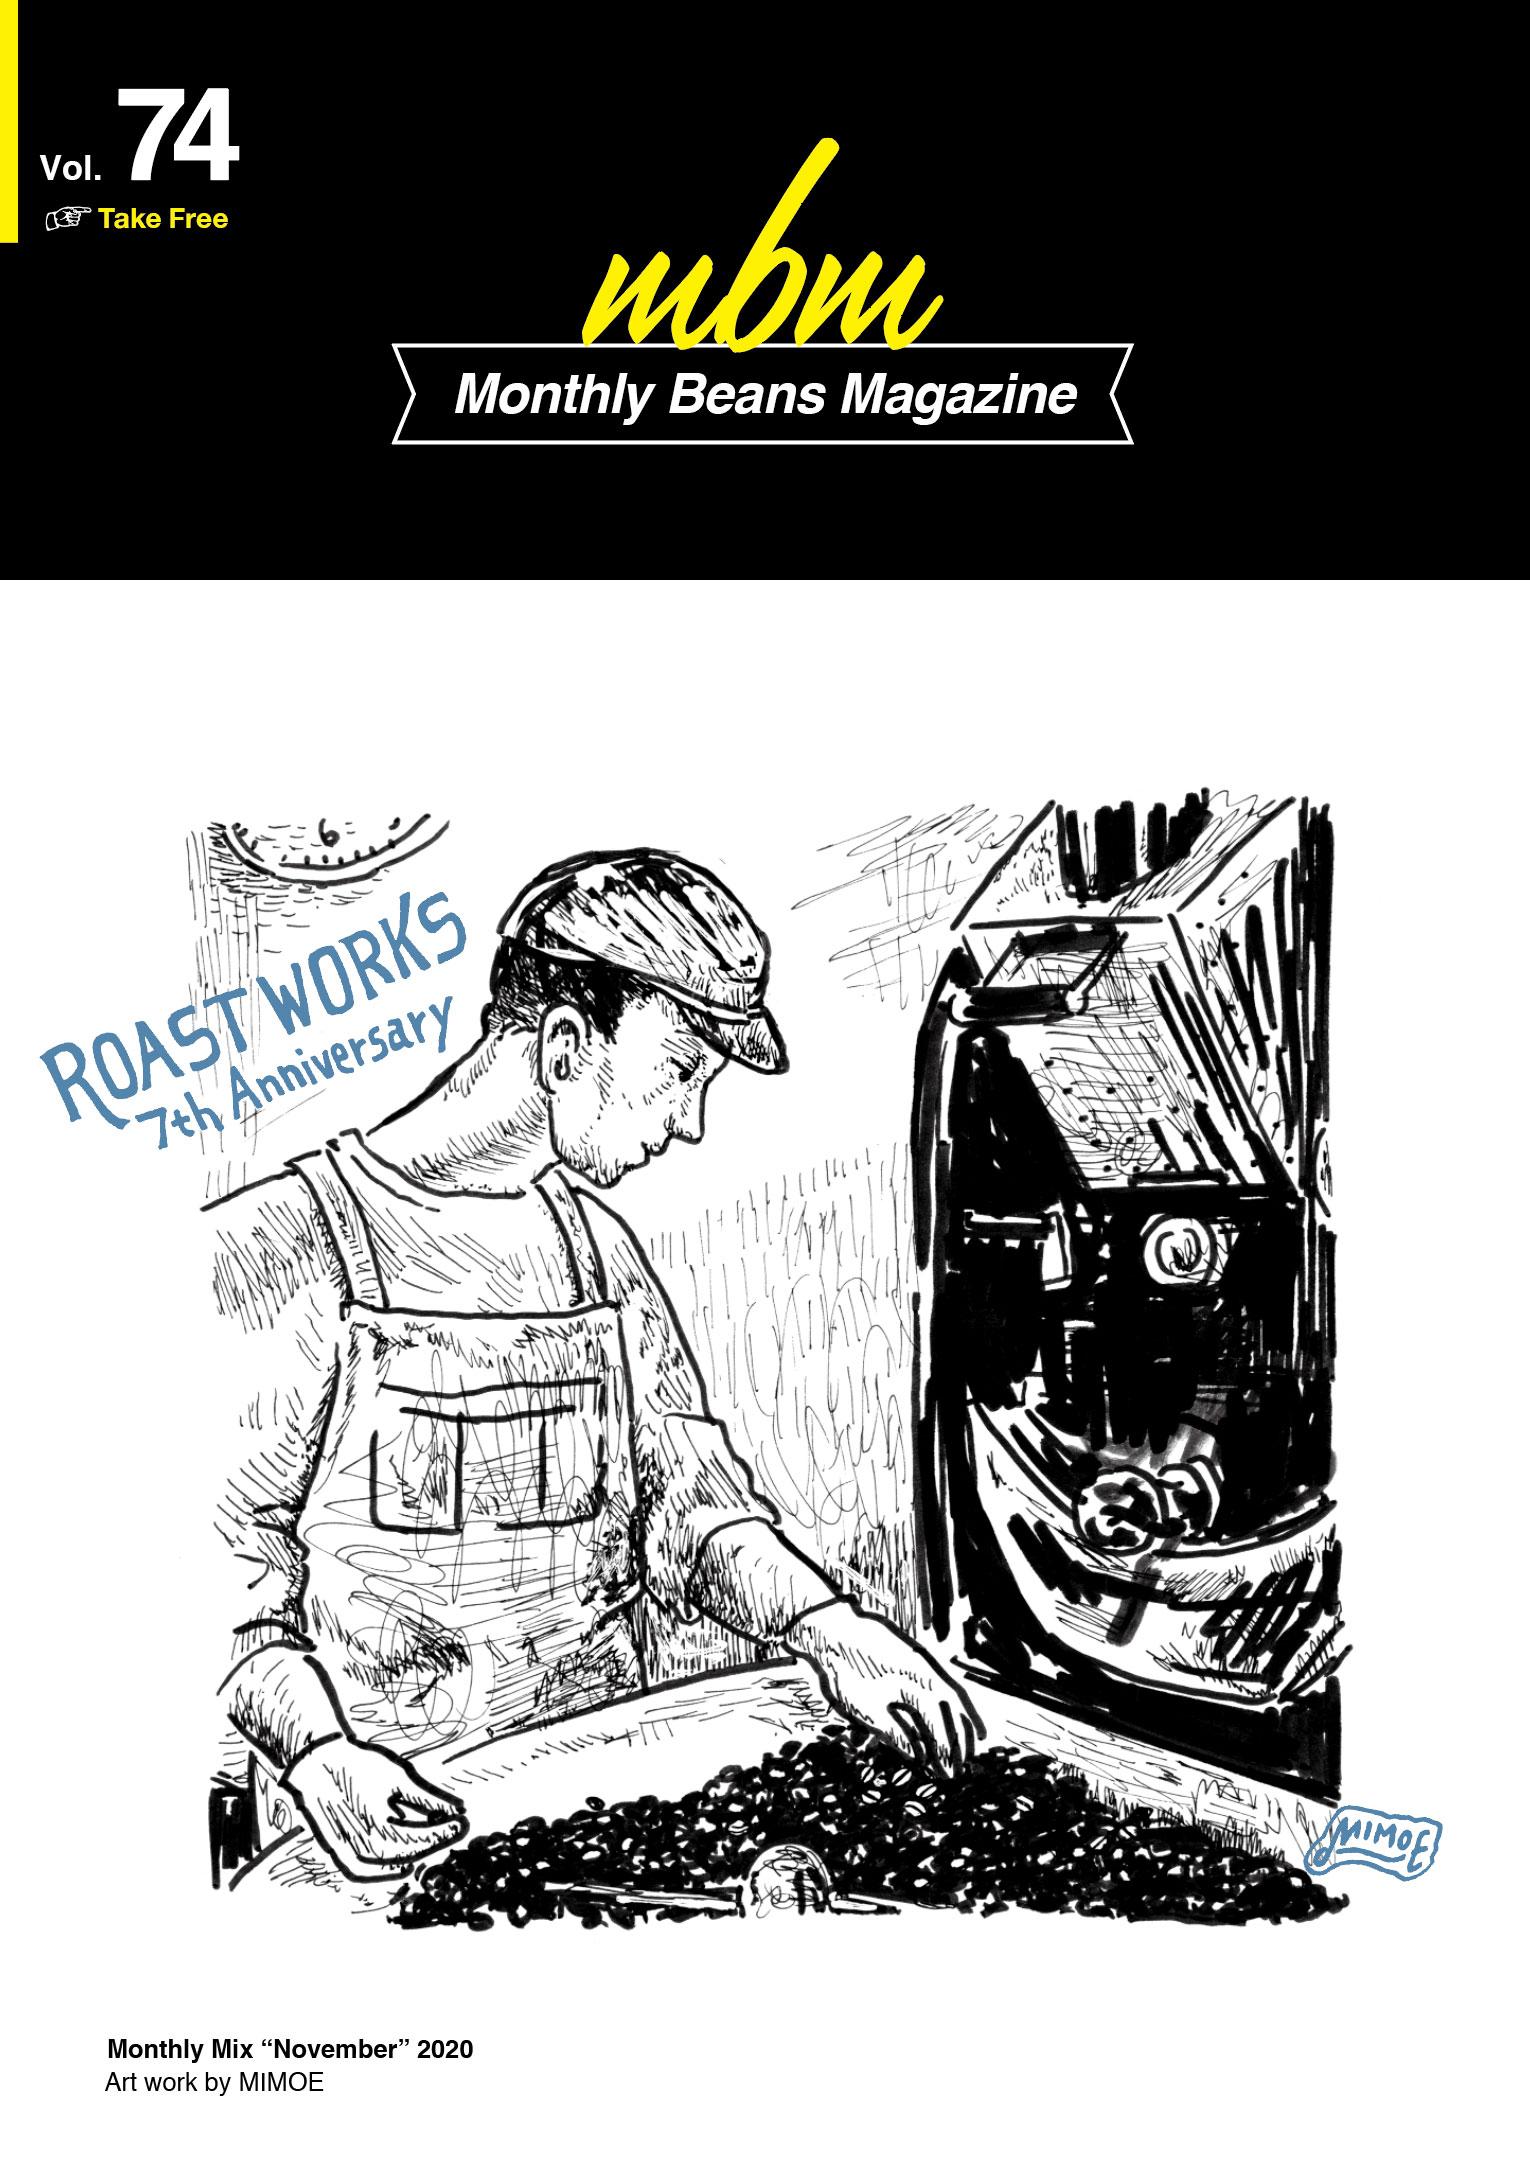 Monthly Beans Magazine